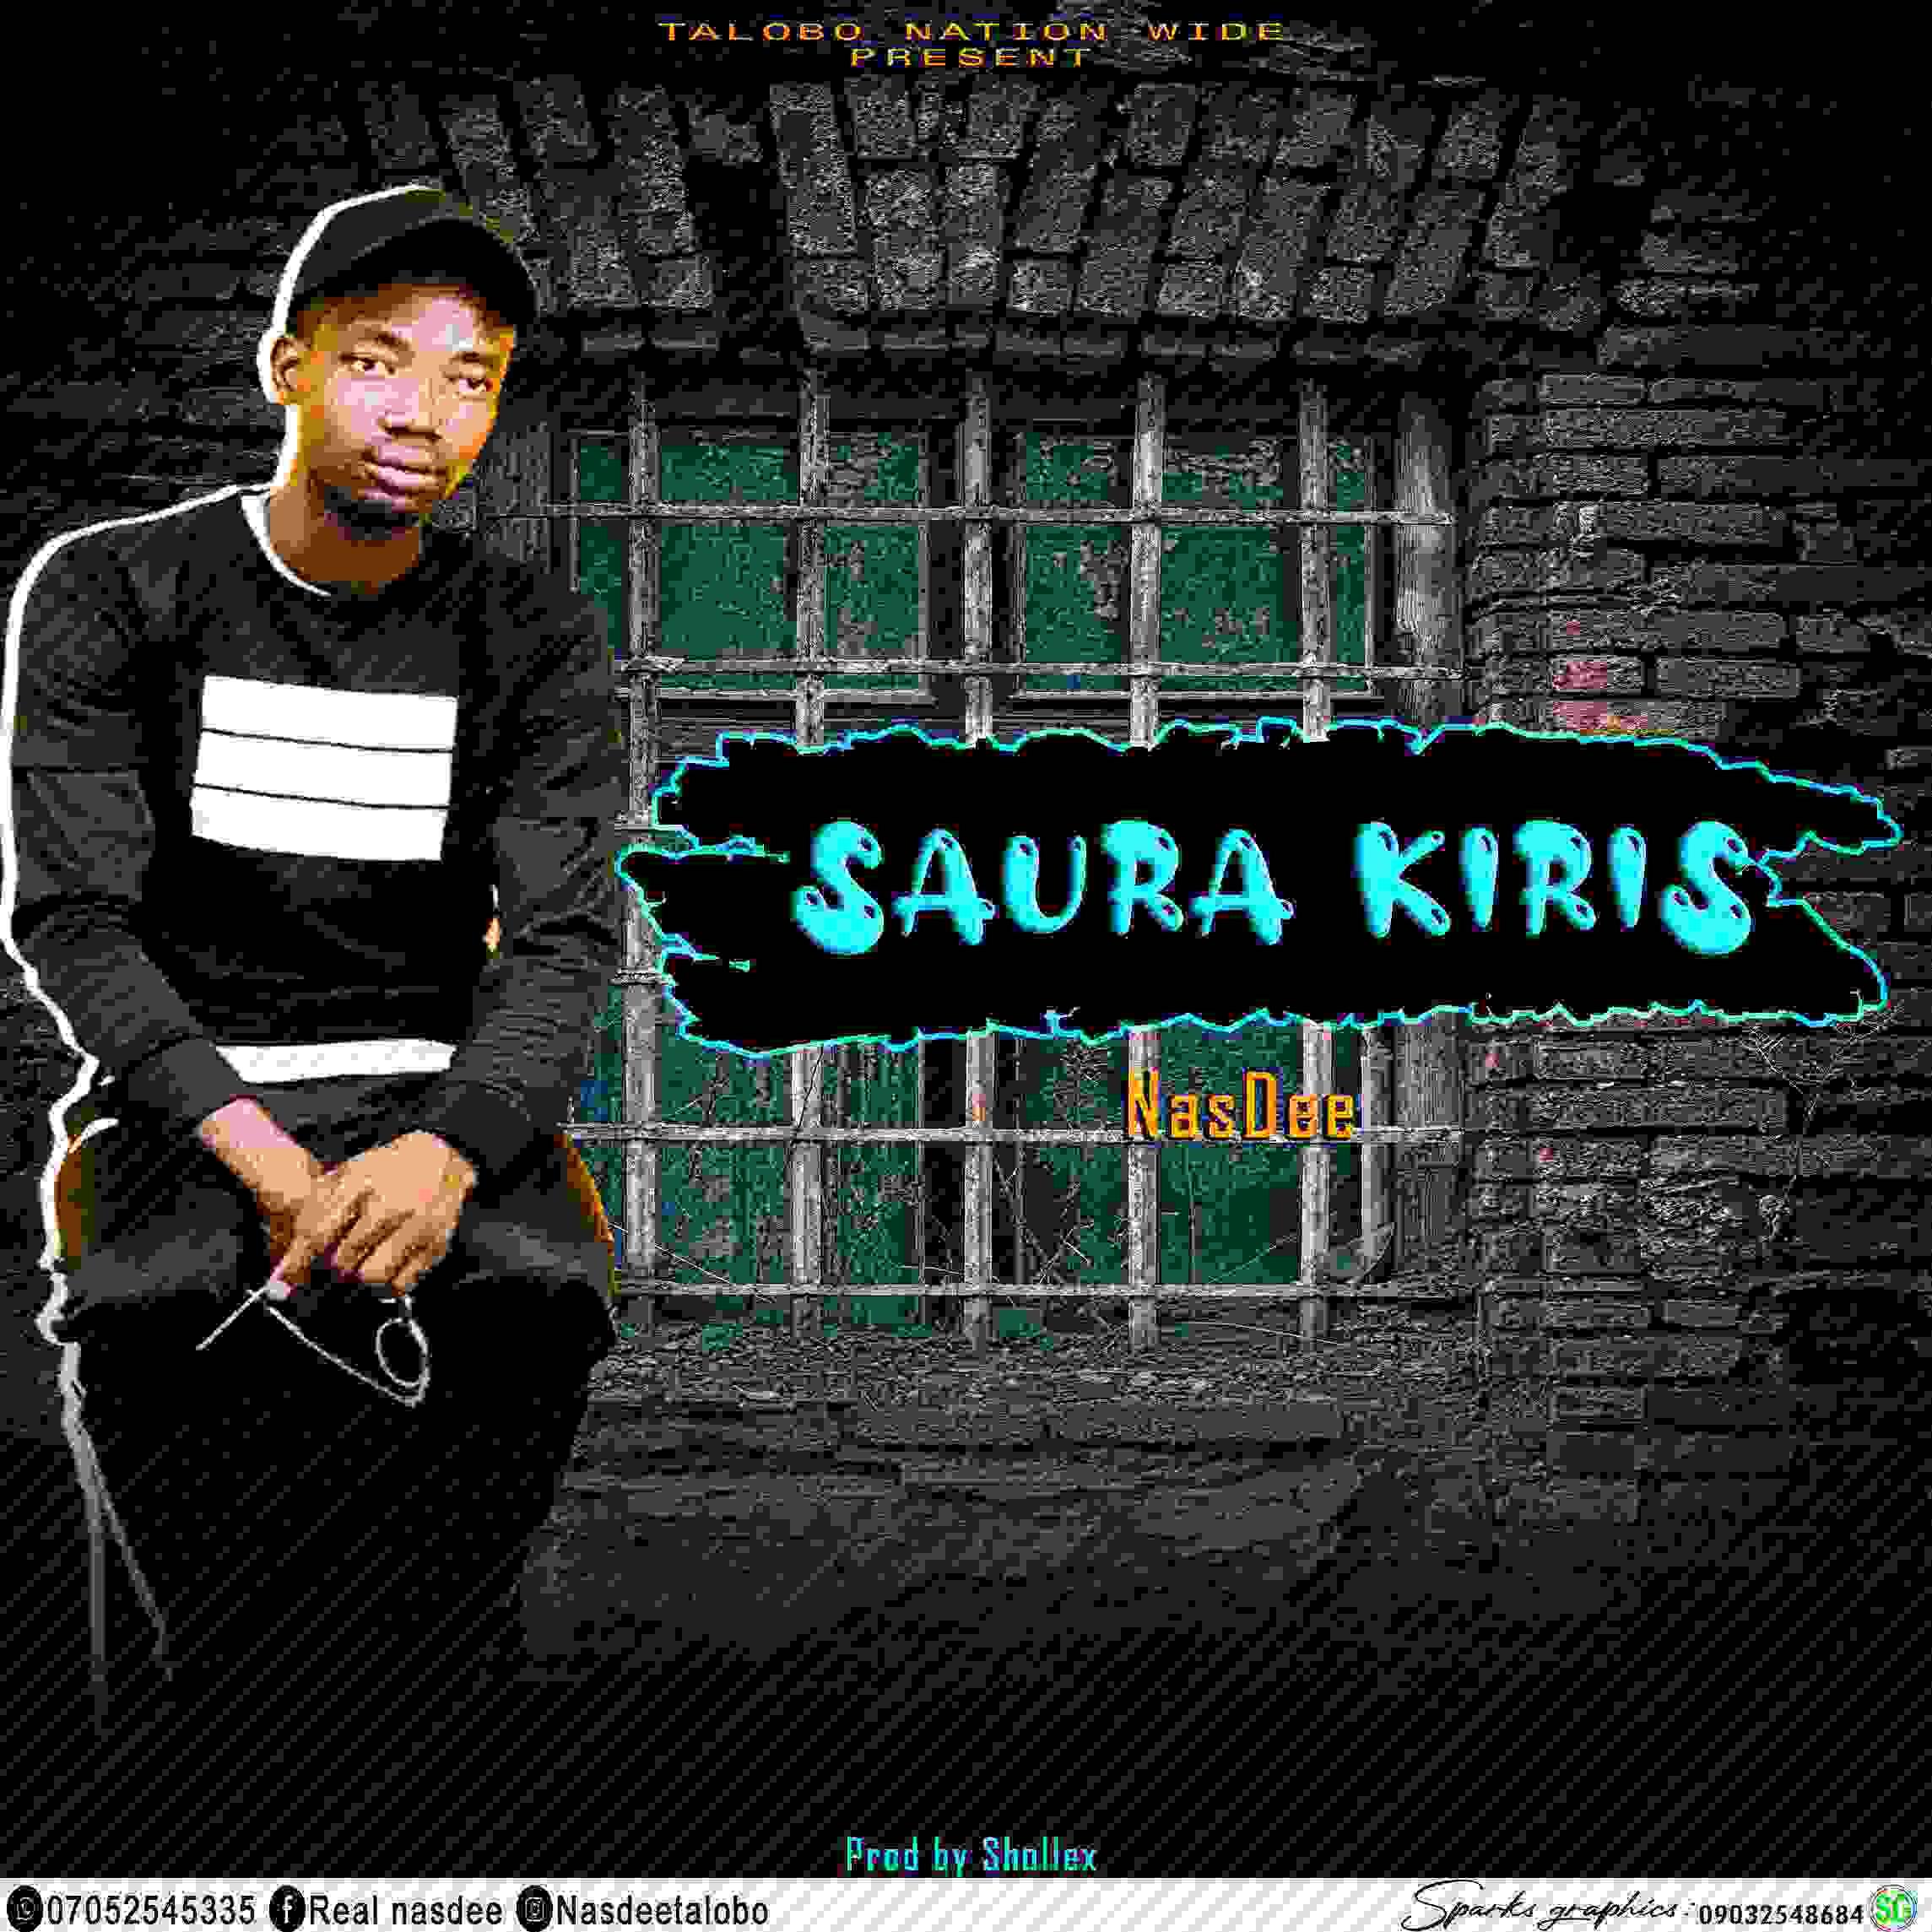 Download Nasdee Saura Kiris Music Mp3 Audio Songs Talobo